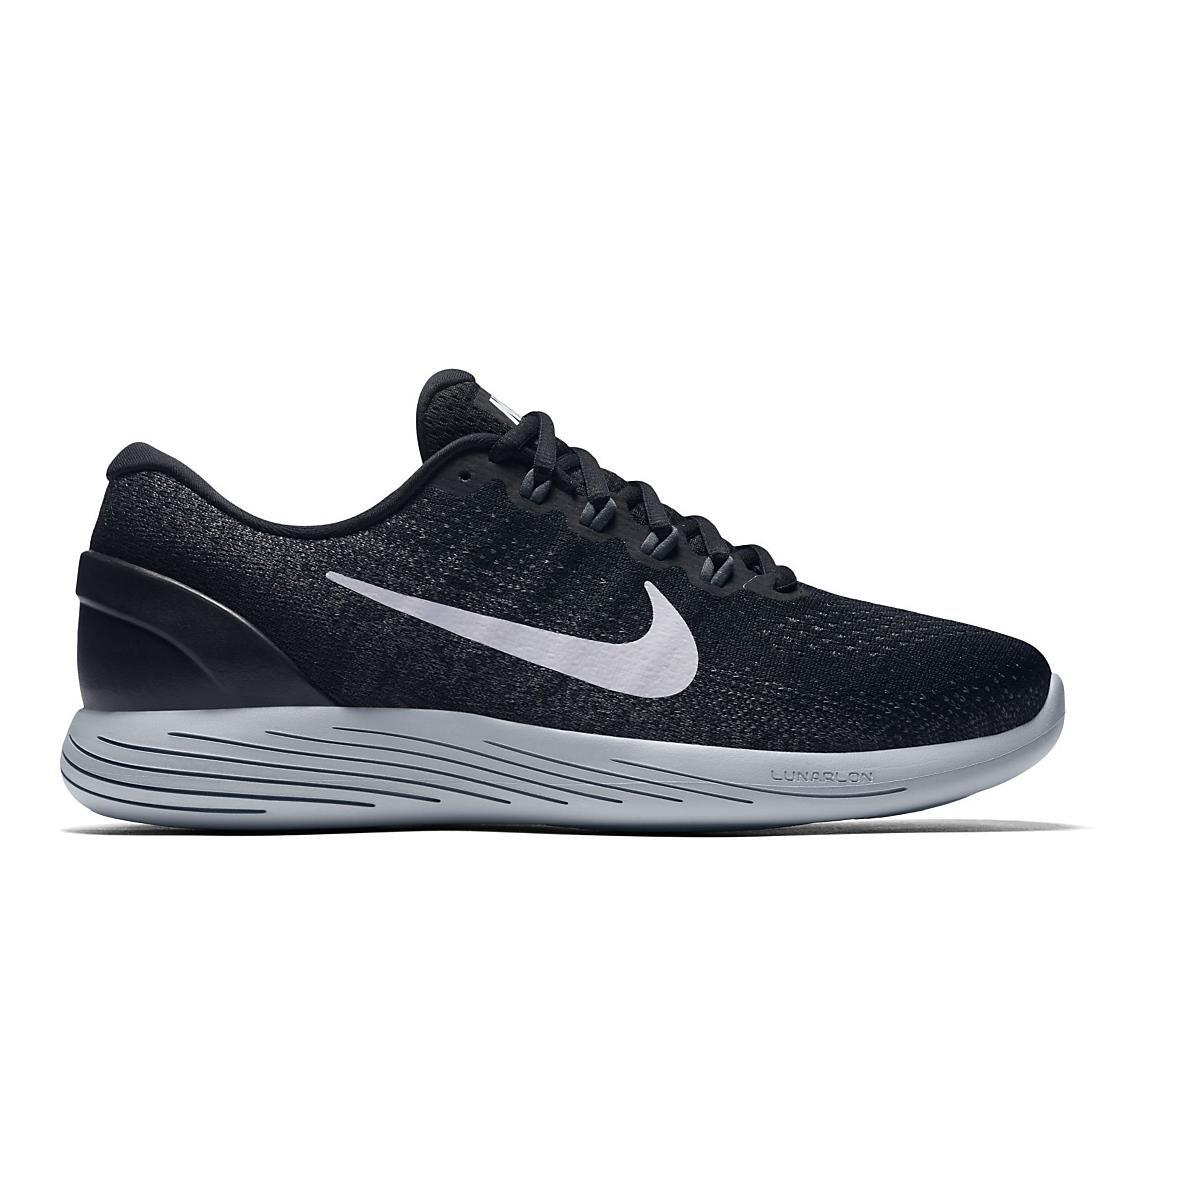 Mens Nike Lunarglide 9 Running Shoe At Road Runner Sports